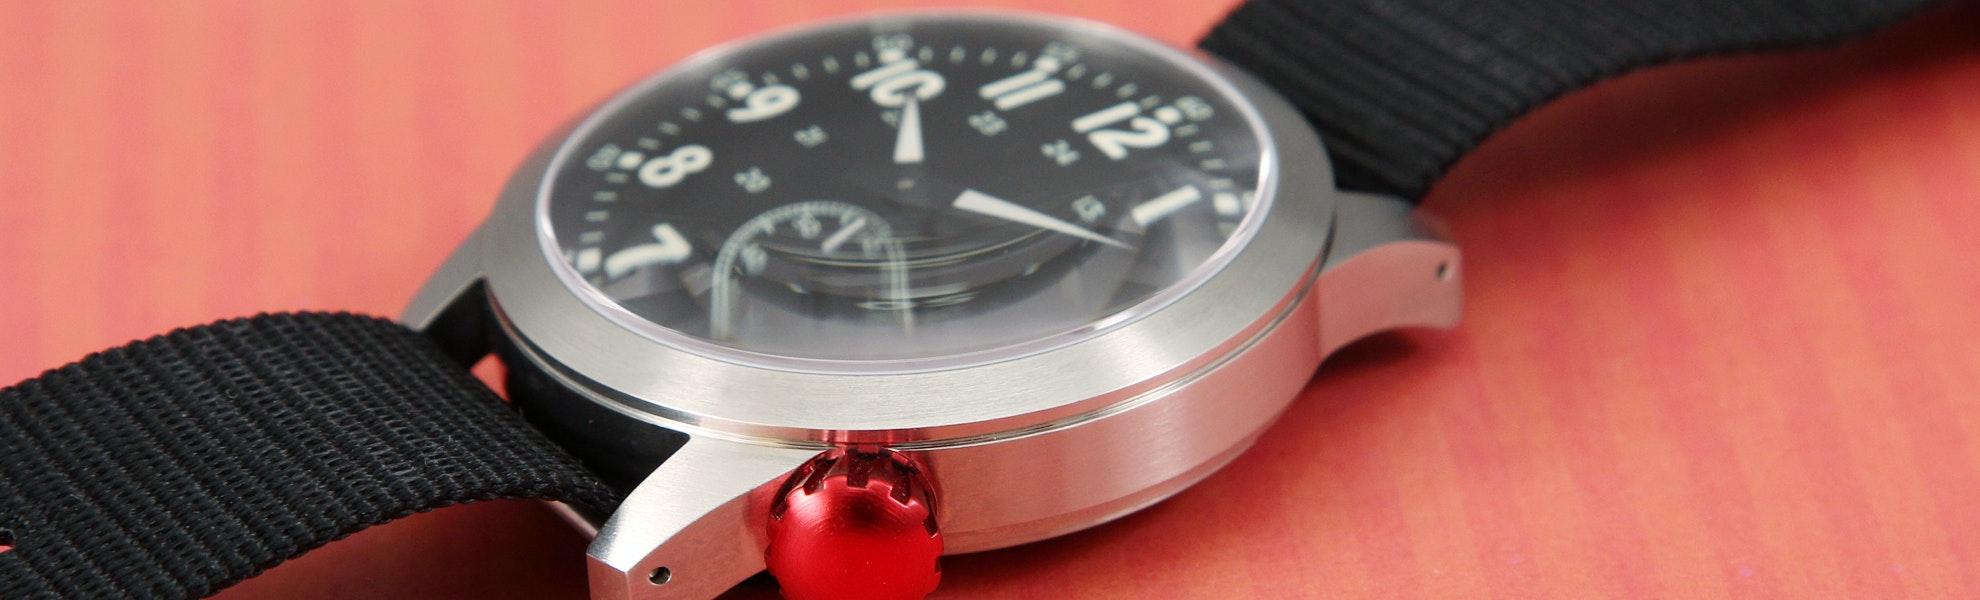 Maratac Large Pilot Red Crown Watch